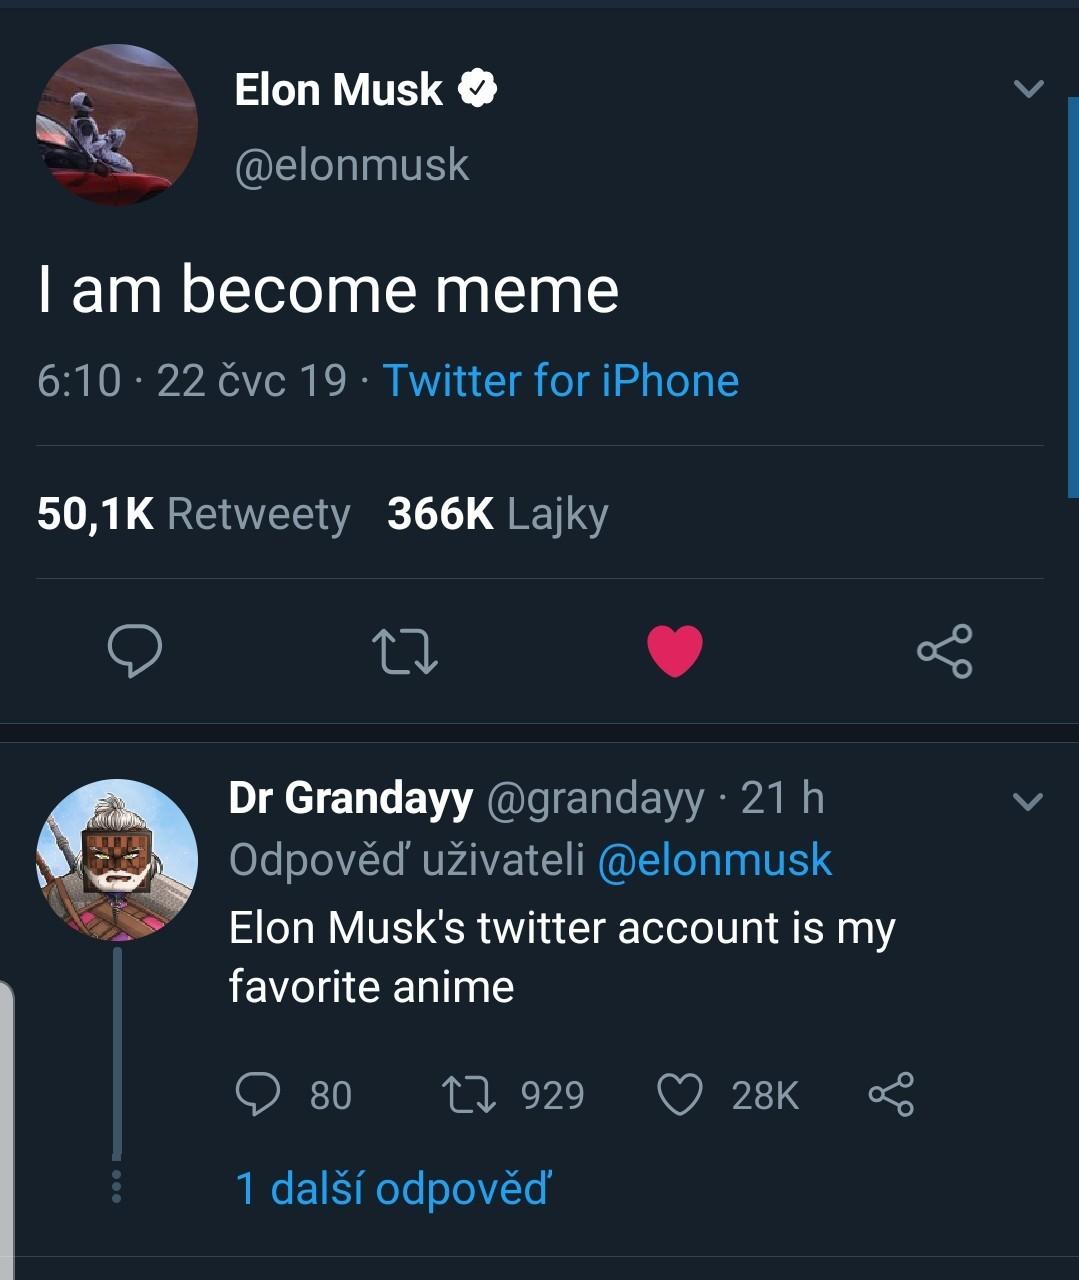 Elon musk anime  - meme